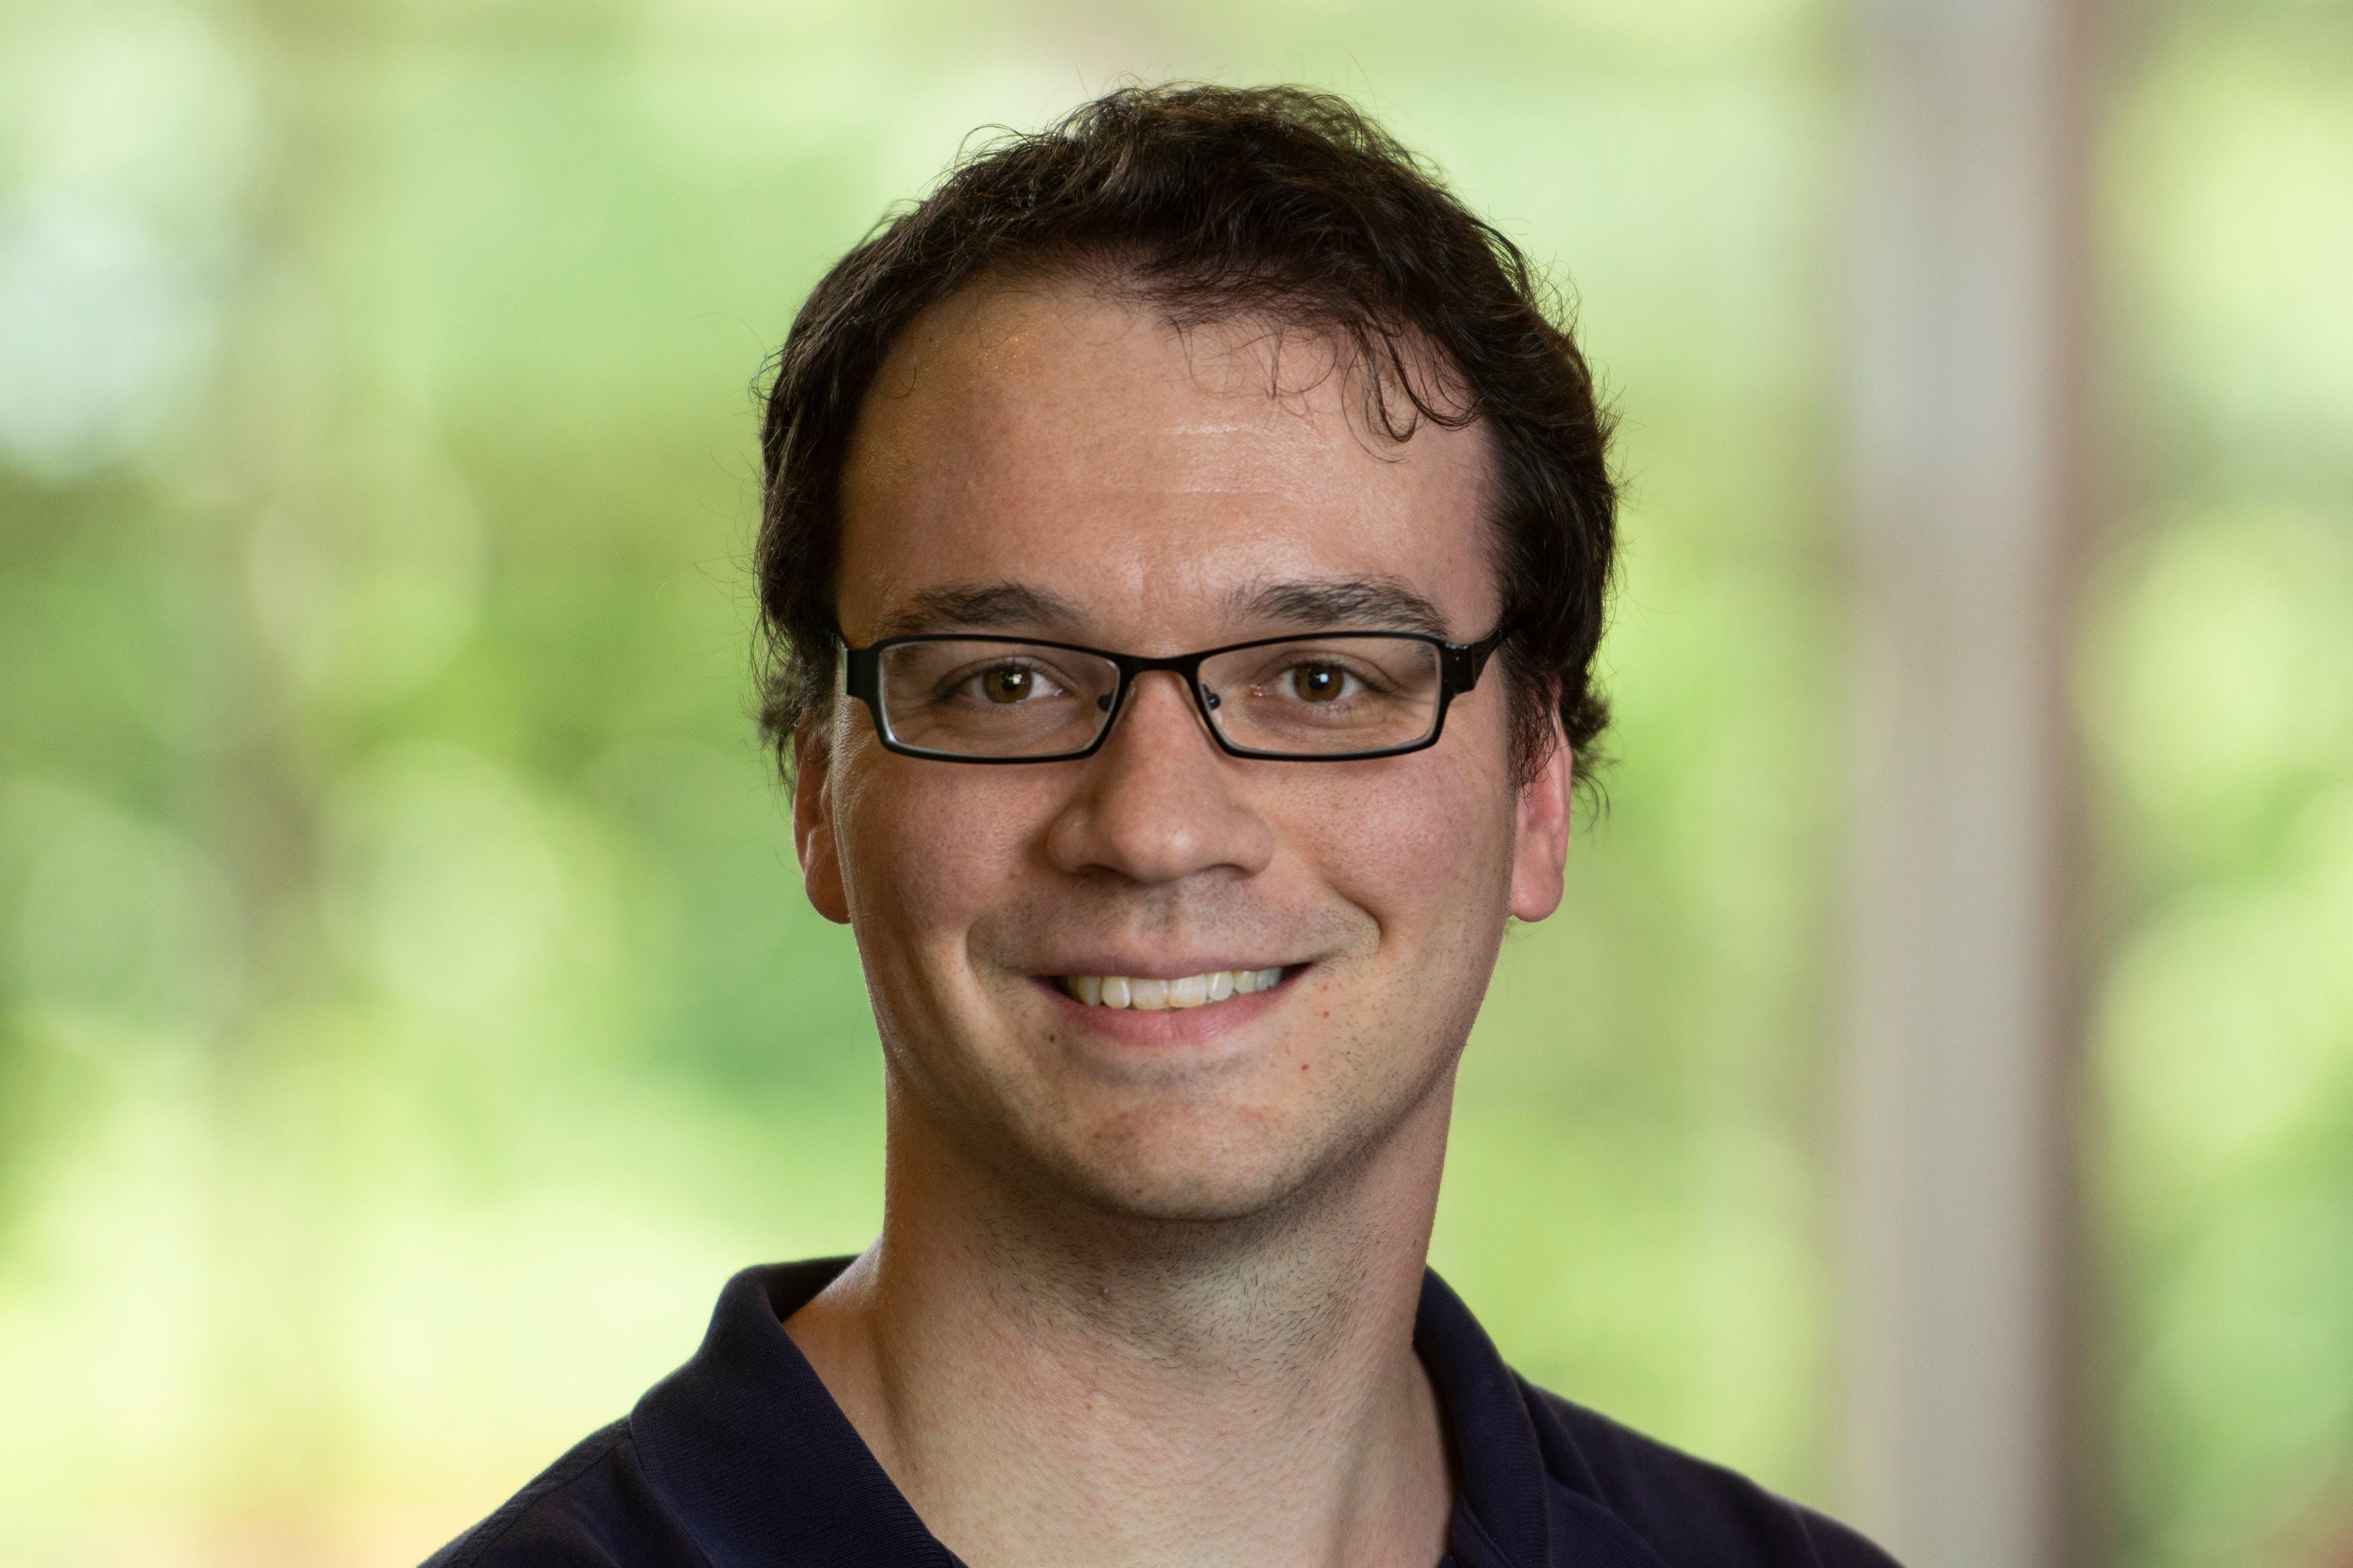 Daniel Sibert